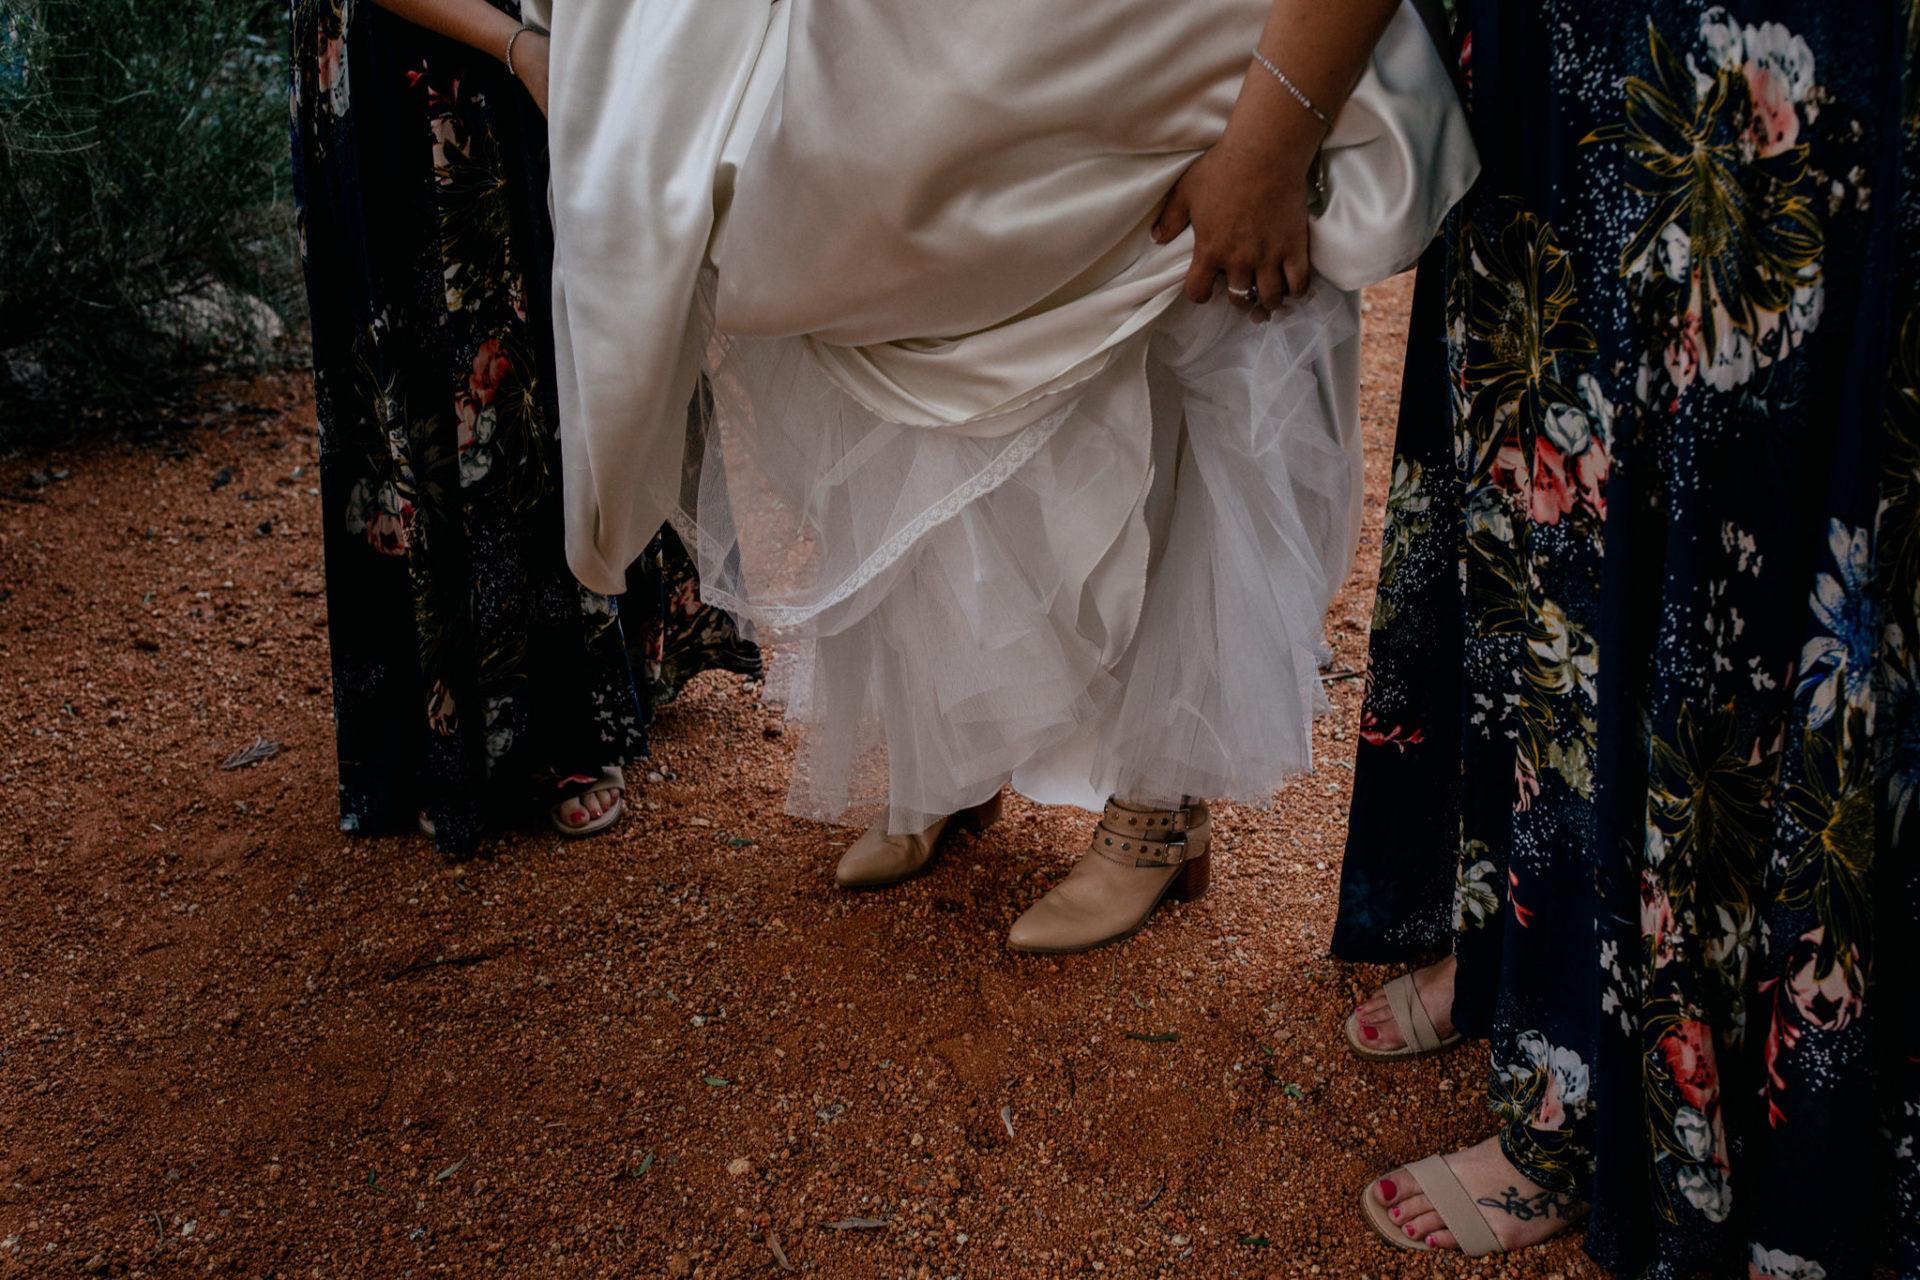 backyard-wedding-australia-melbourne-bride-bridesmaid-shoe-detail-boots